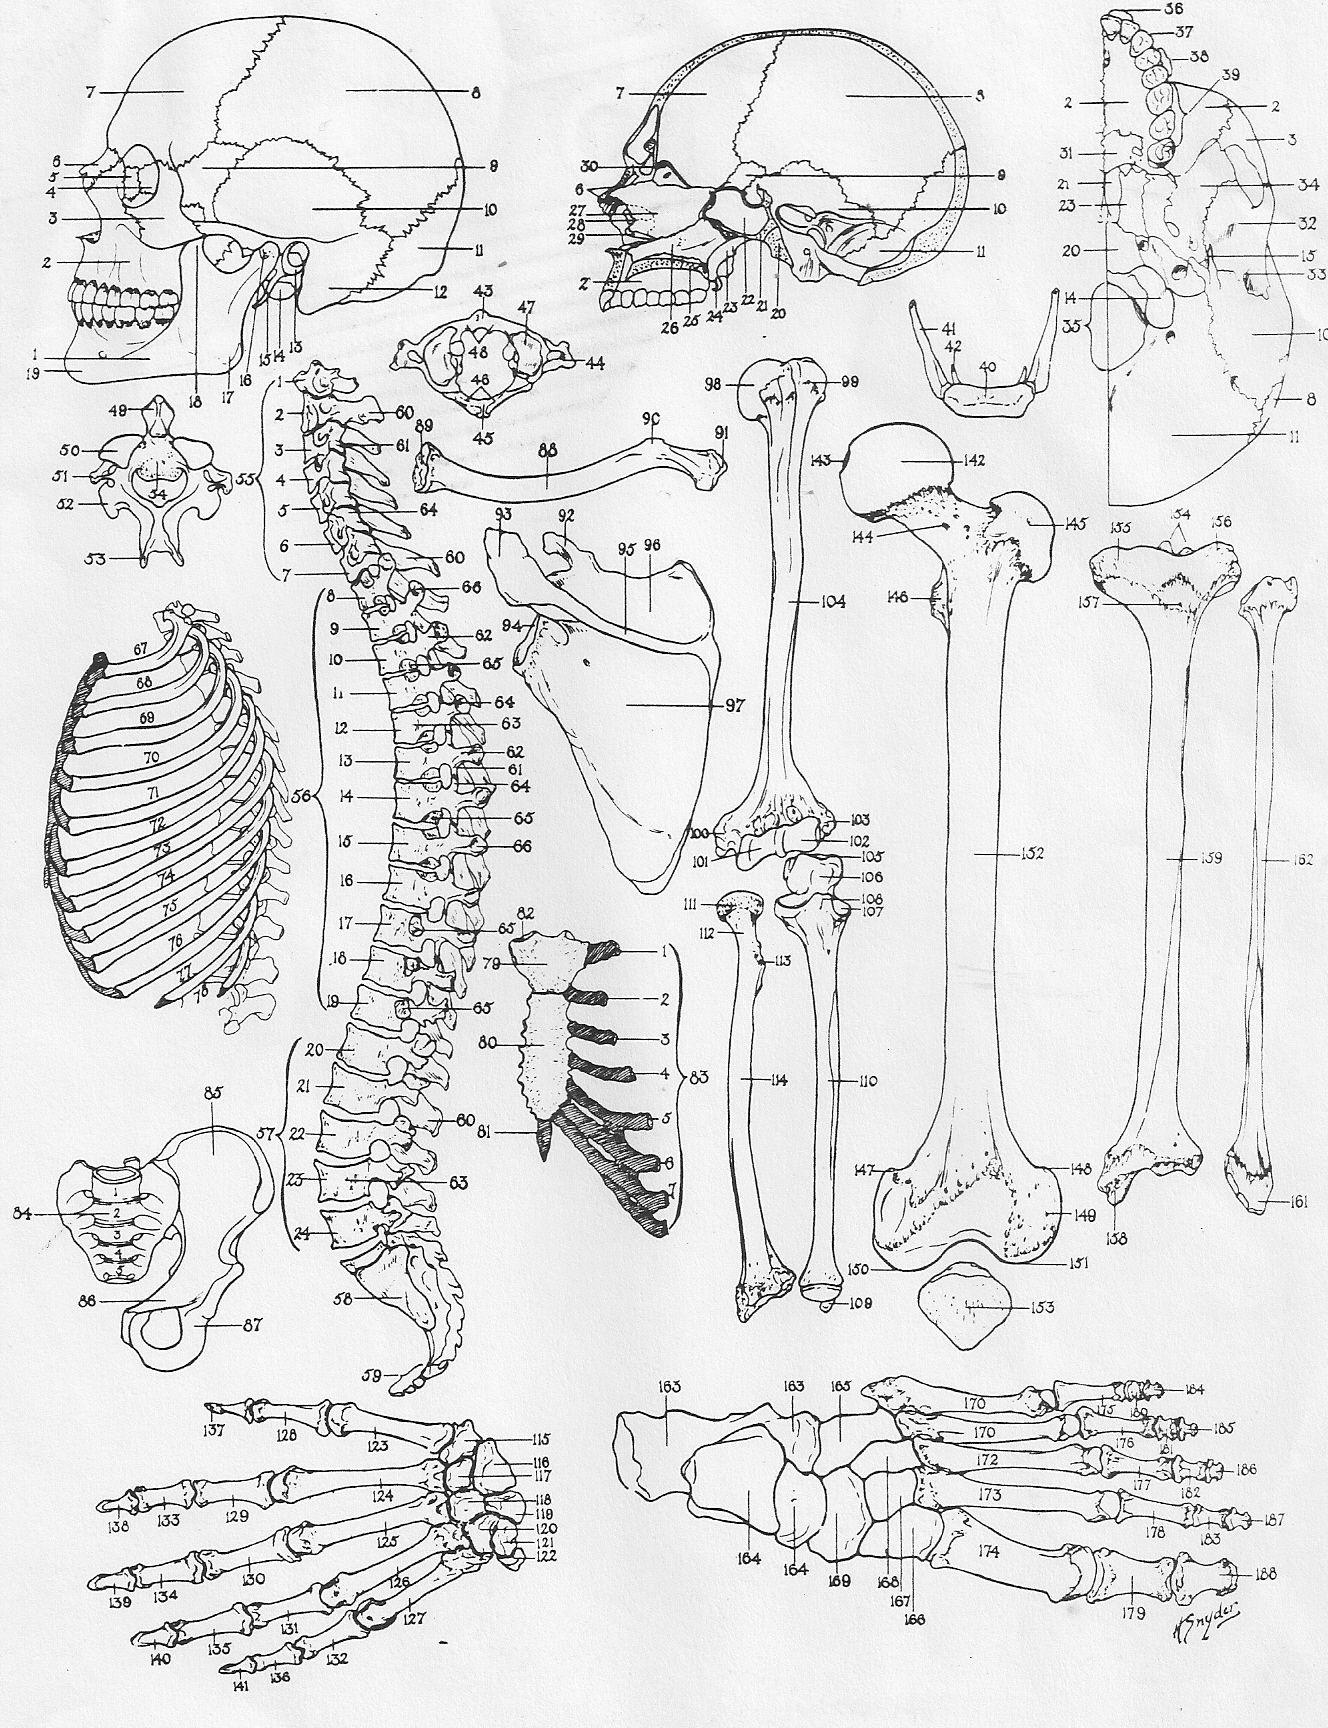 gross anatomy coloring book bone diagramcoloring human body unit human anatomy gross book anatomy coloring